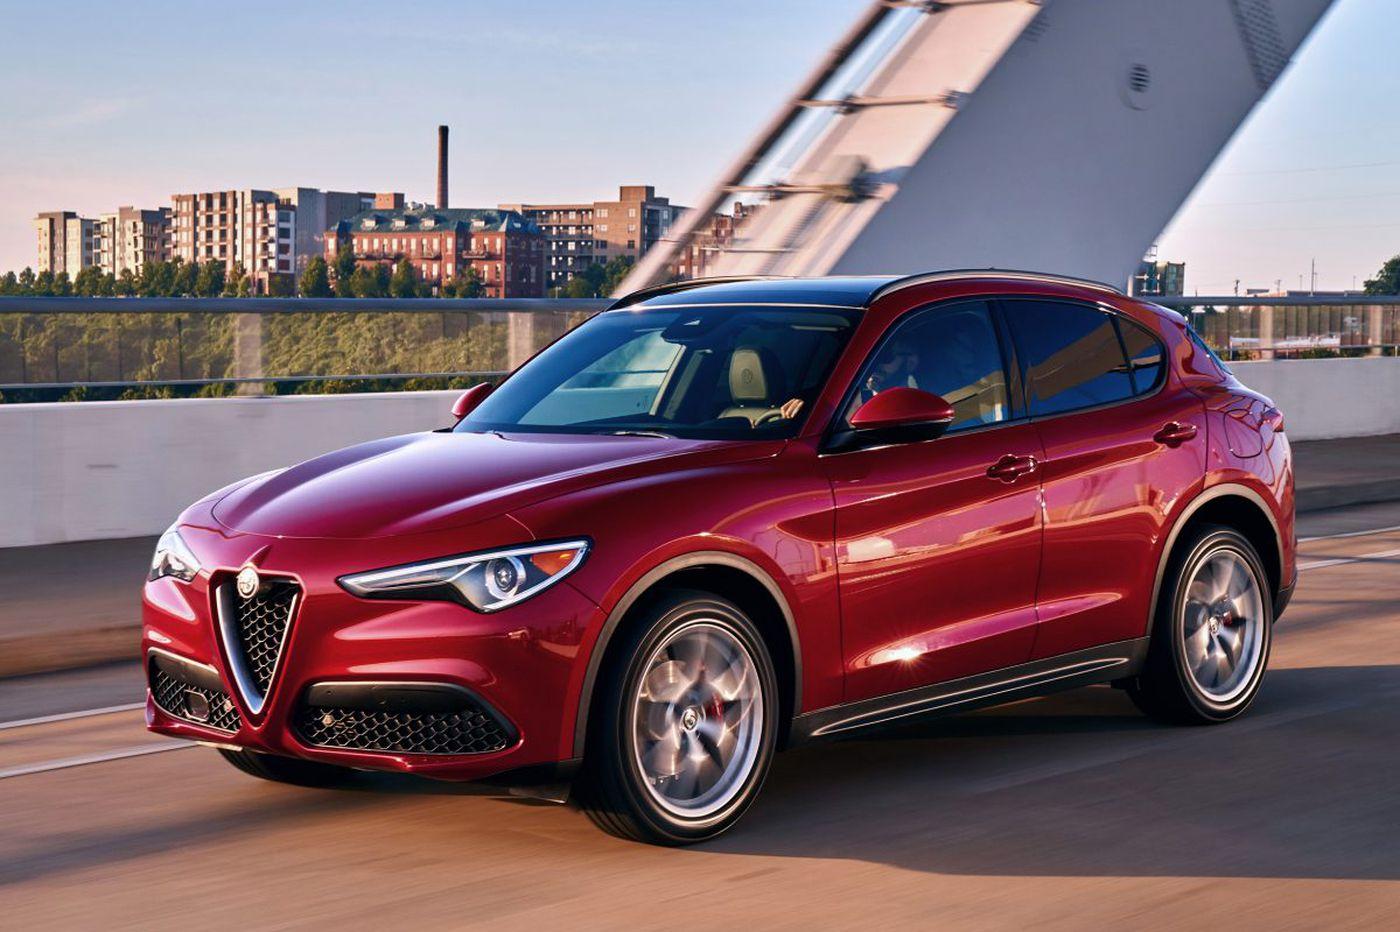 2018 Alfa Romeo Stelvio: As fun as its unusual name